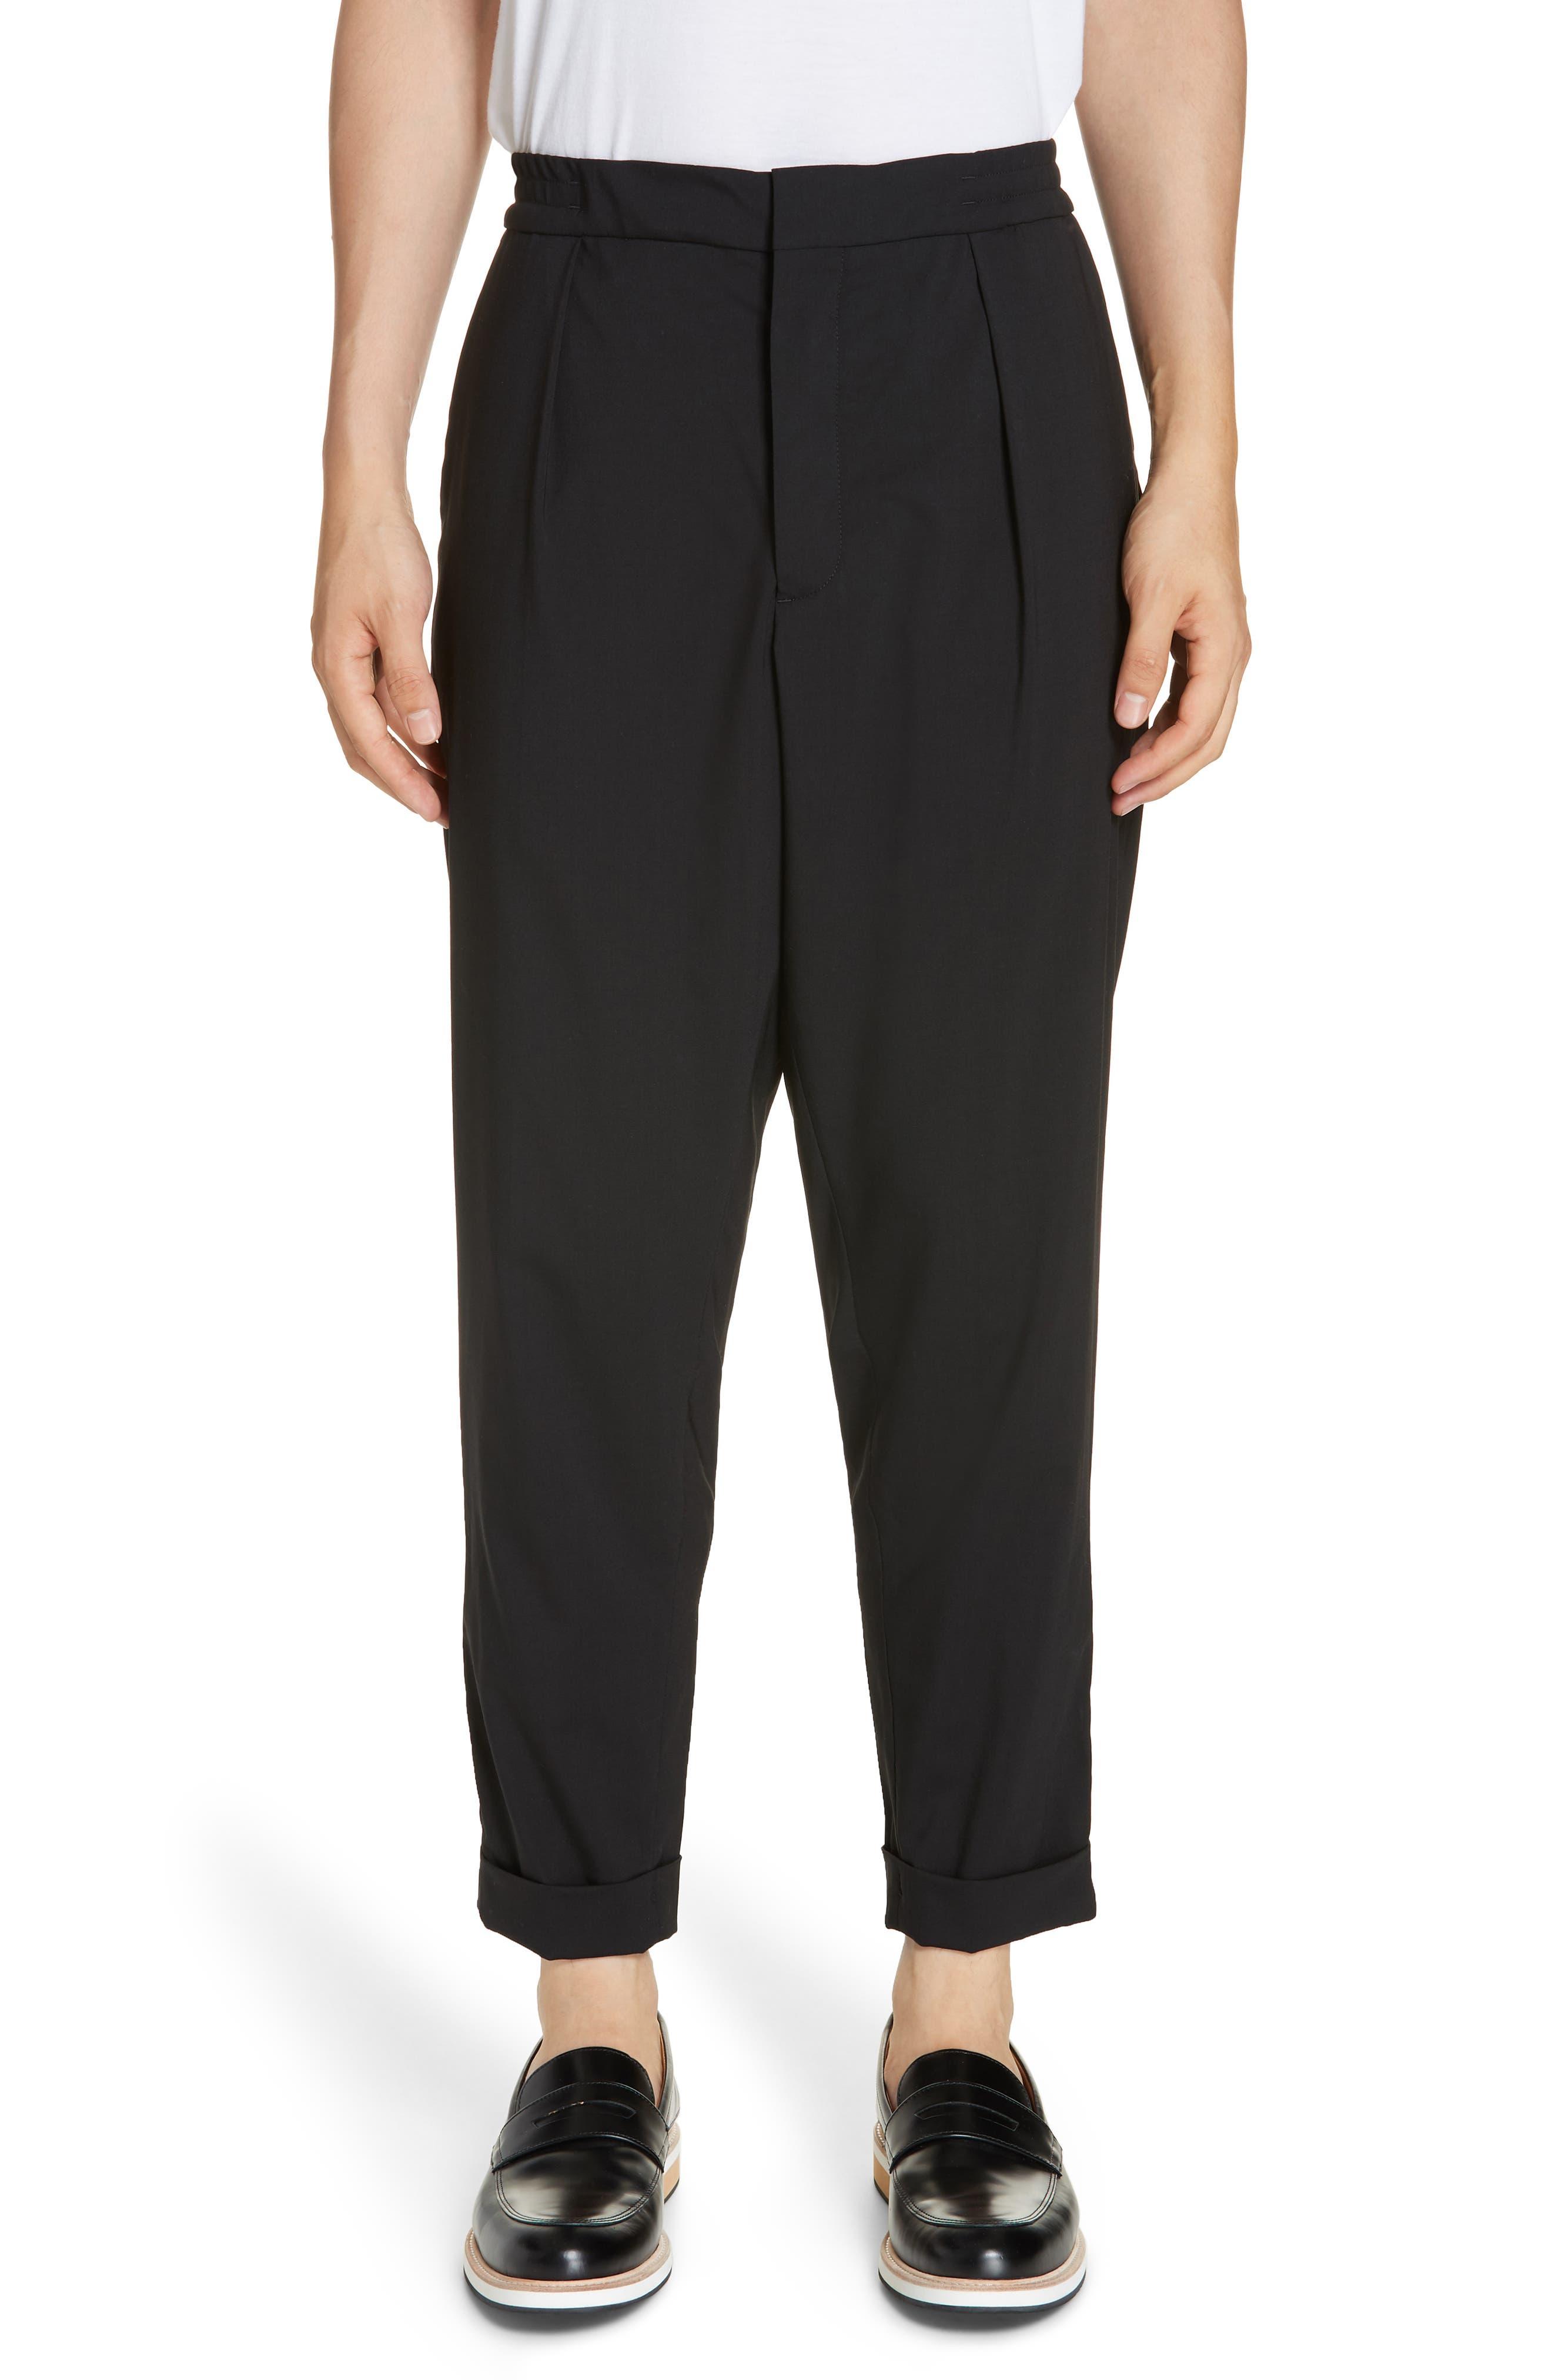 Barena Venzia Tropical Wool Pants,                             Main thumbnail 1, color,                             001